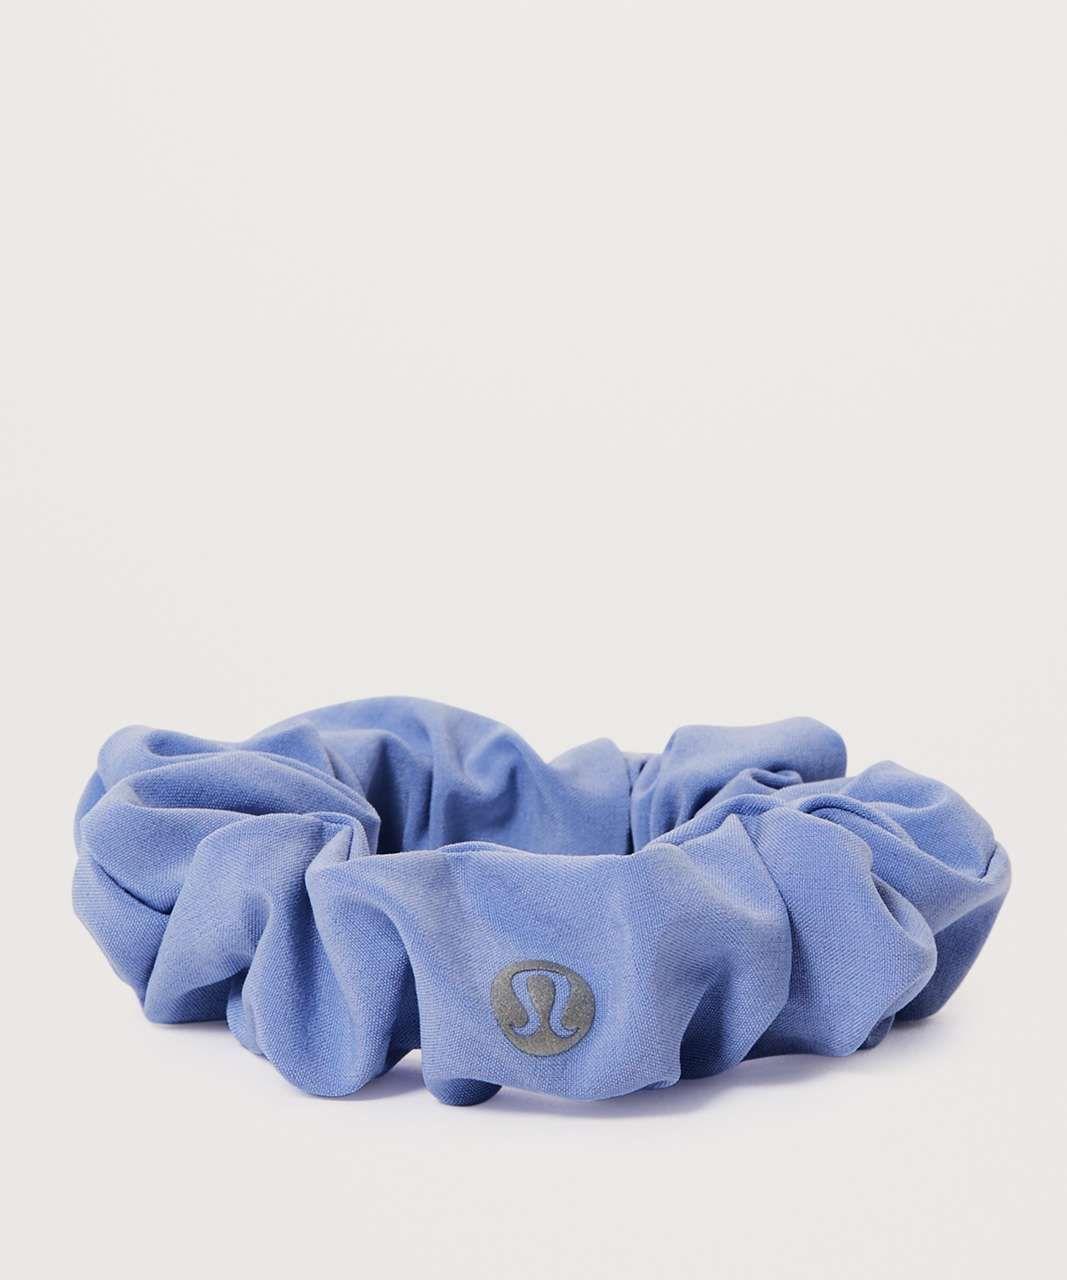 Lululemon Uplifting Scrunchie - Hydrangea Blue